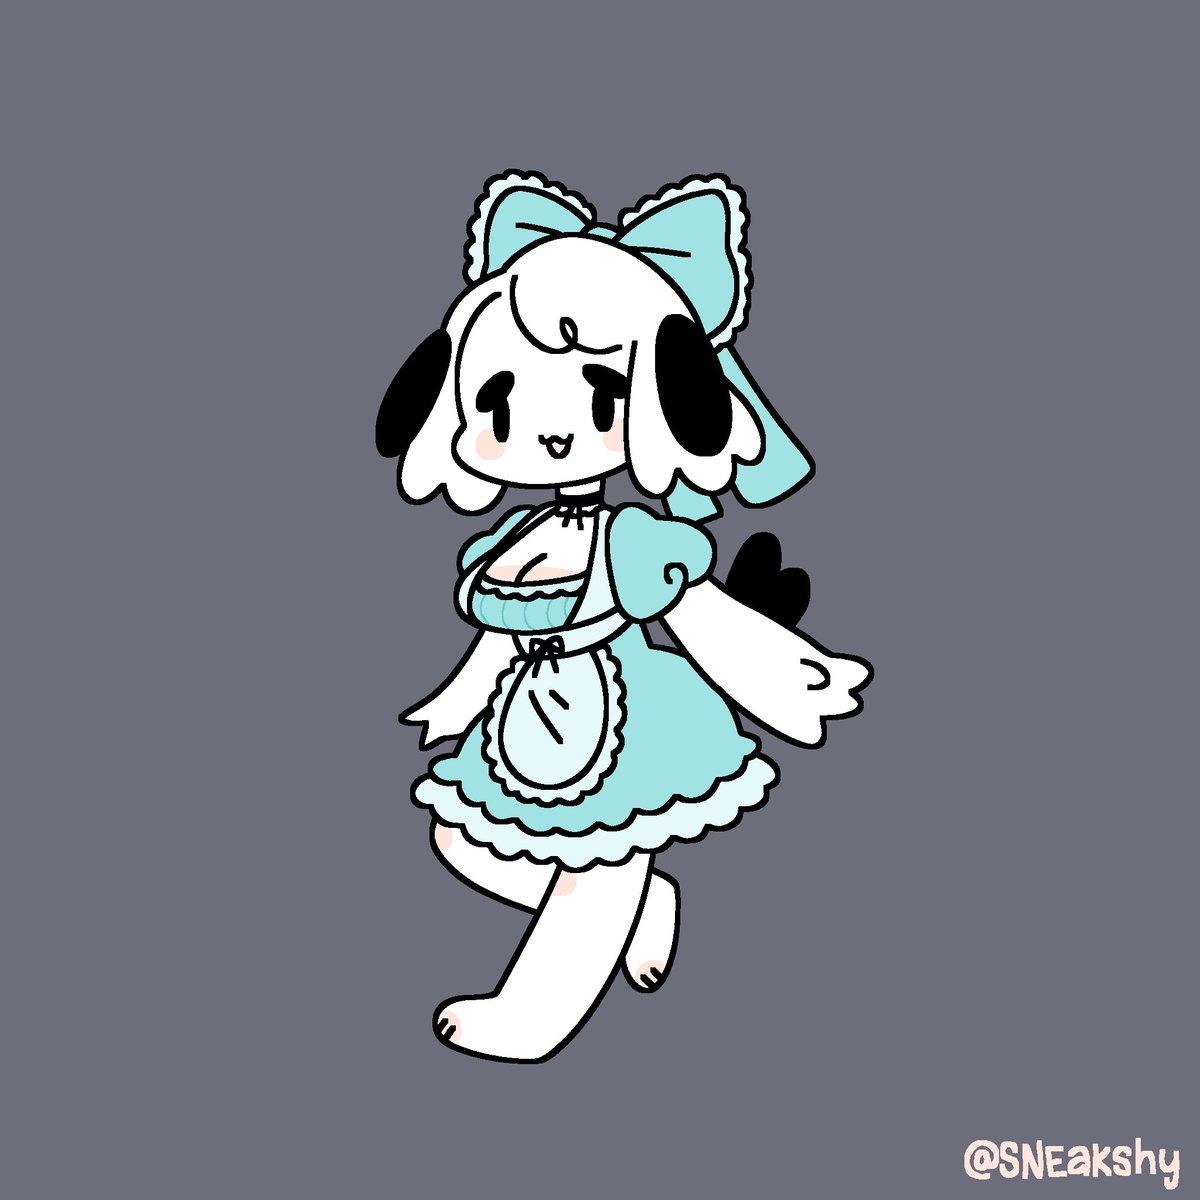 maid pup is so cute!! @pupkittyfan1